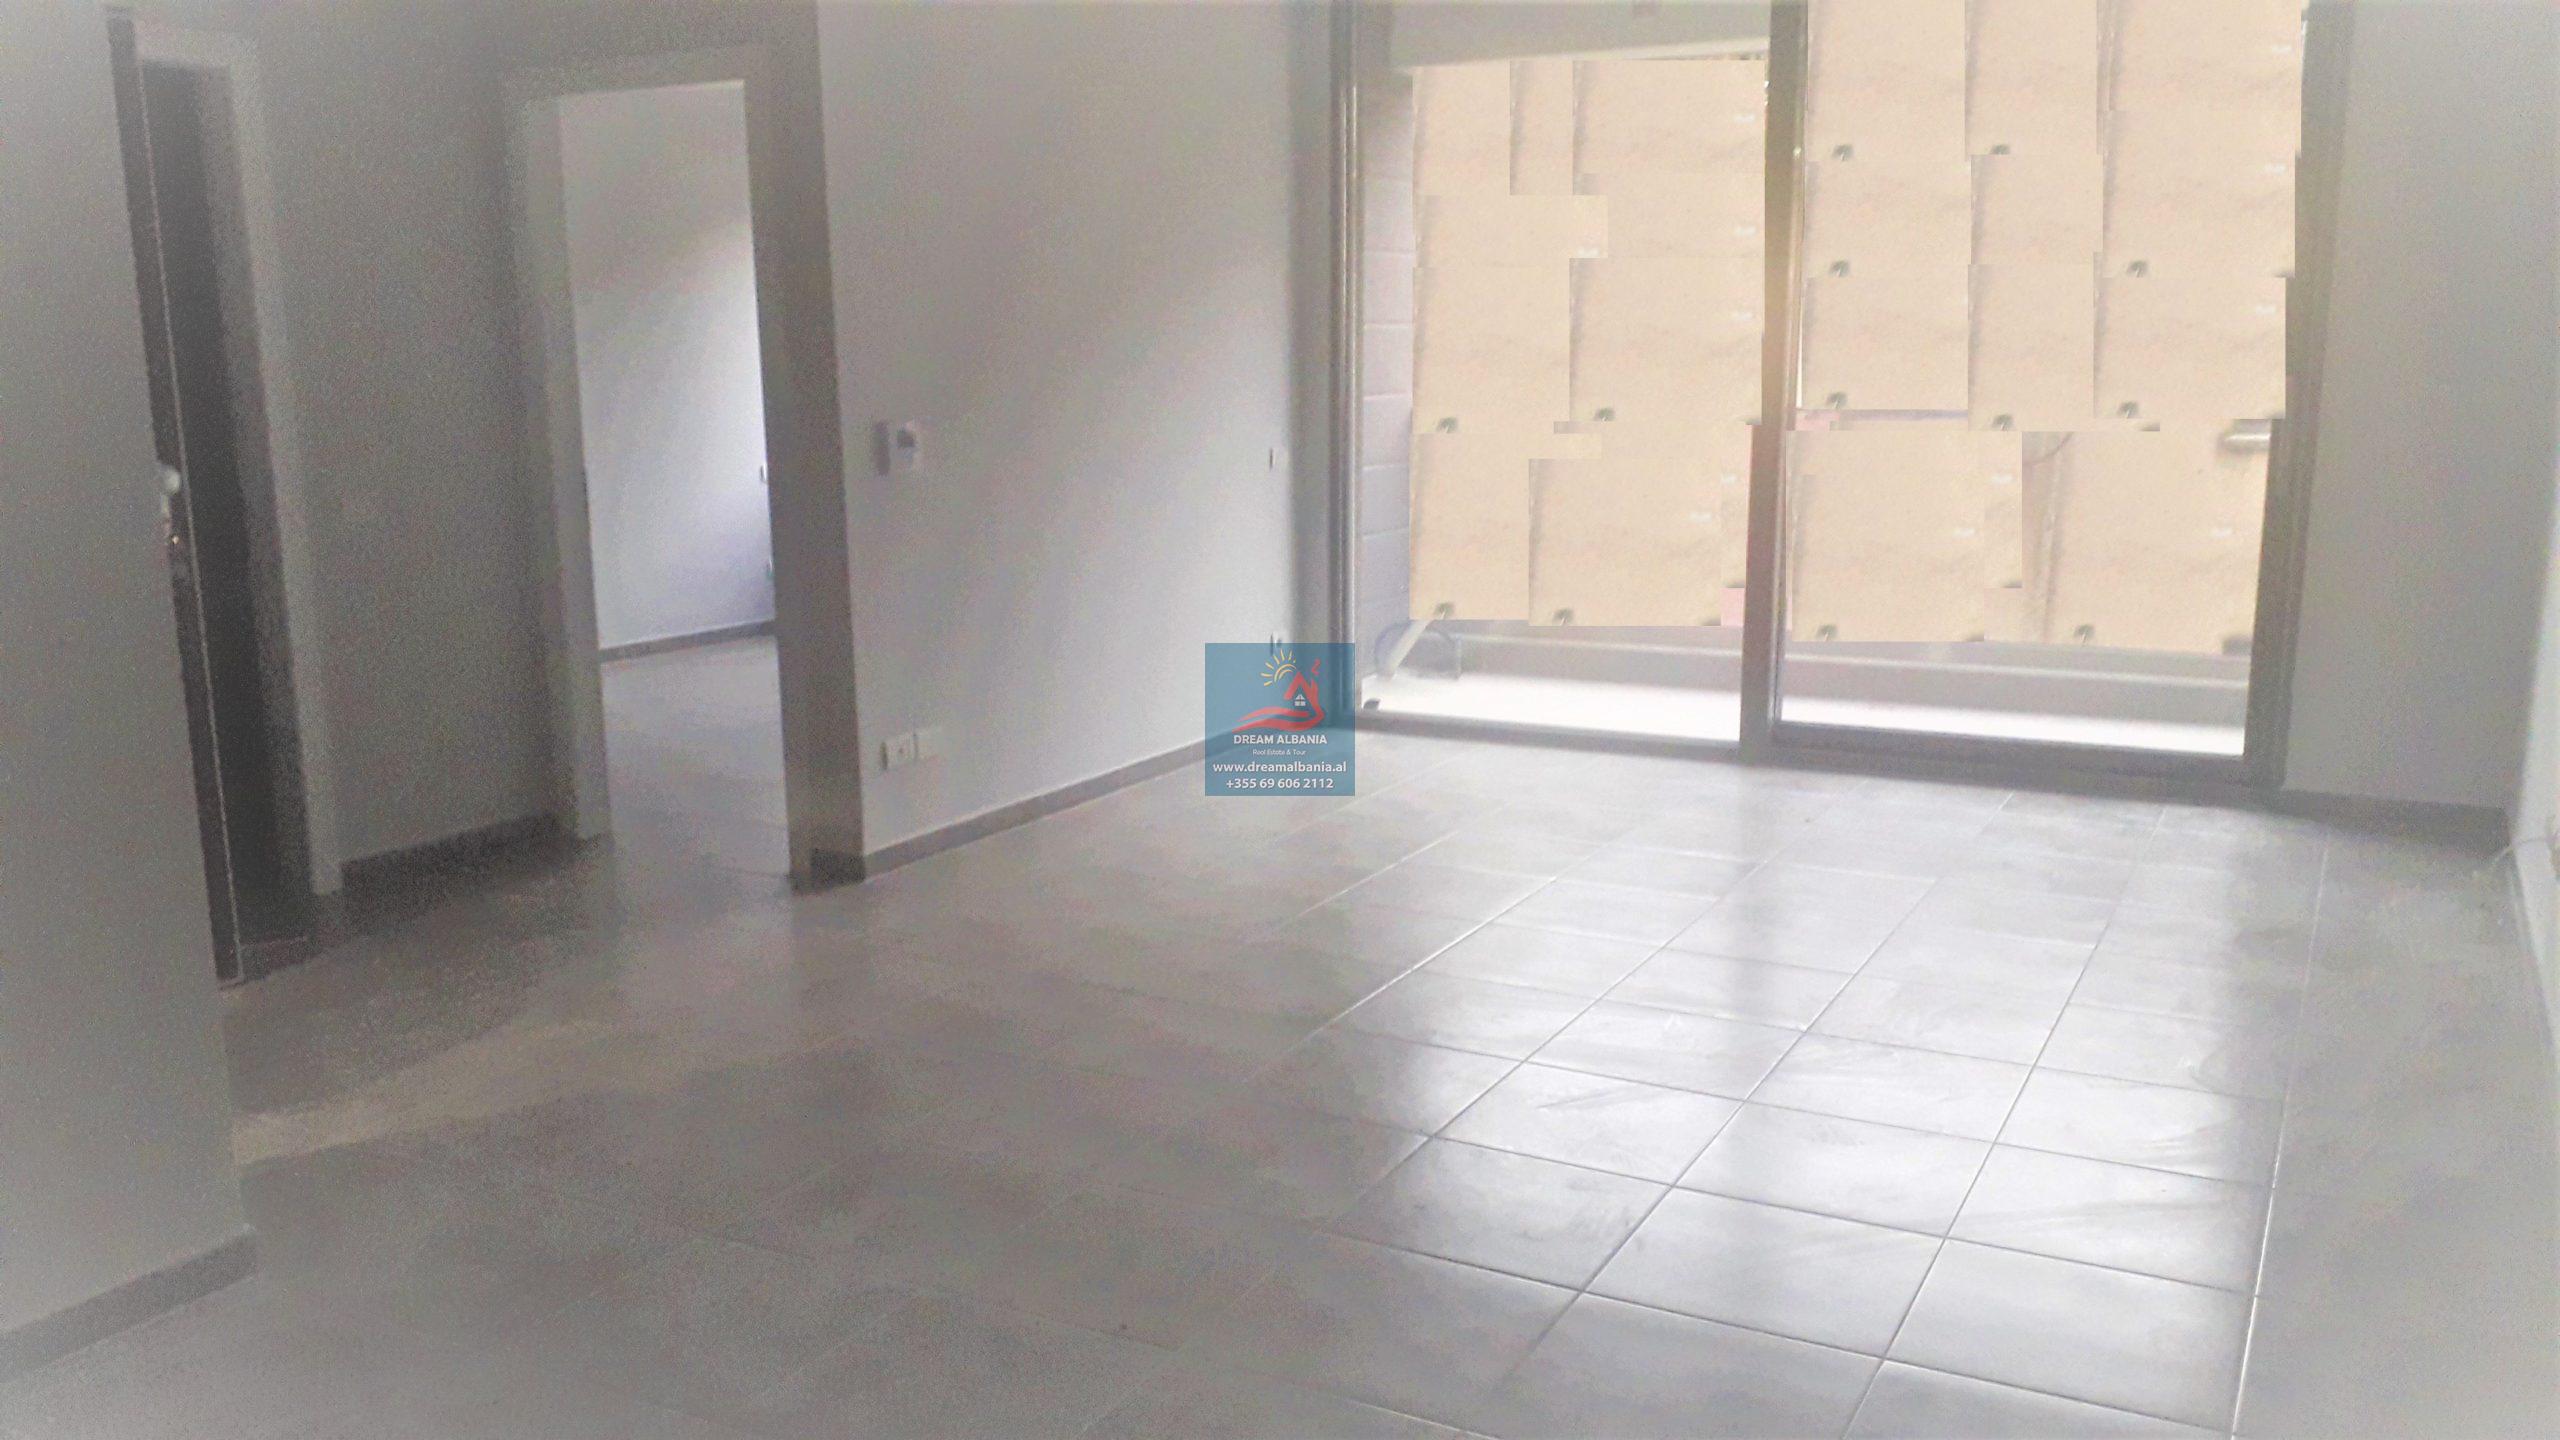 Apartamente 1+1 me qera ne Bllok prane Gardesne Tirane (ID 4211431 )